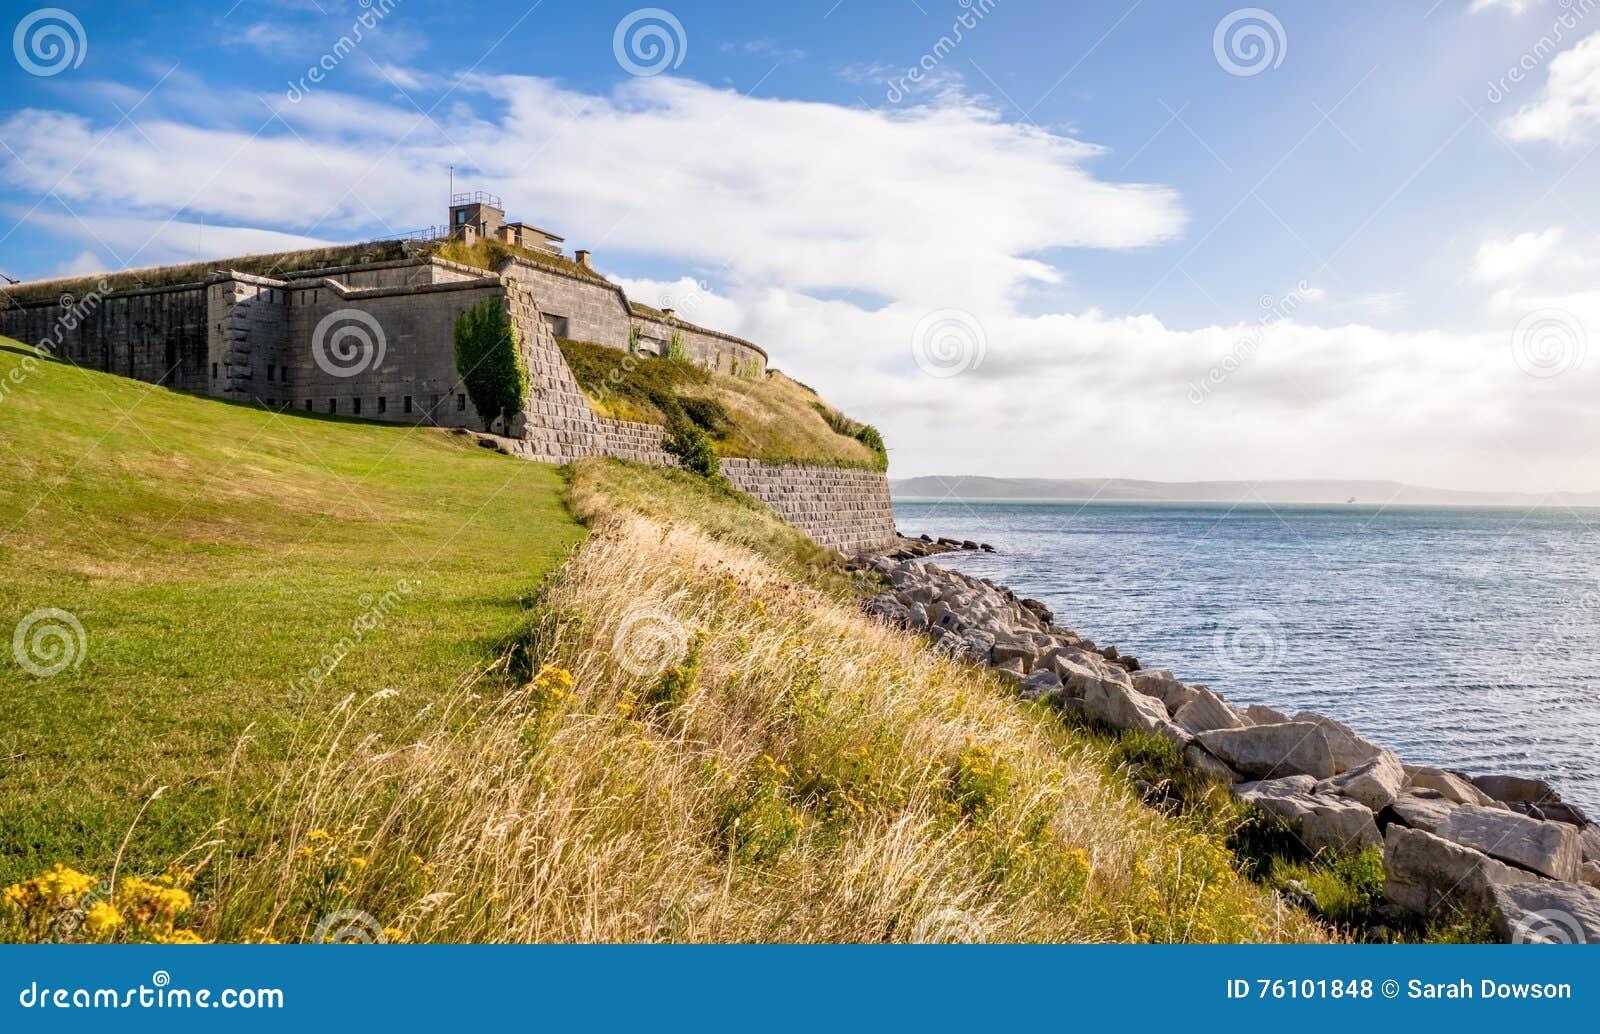 Coastal Fortress